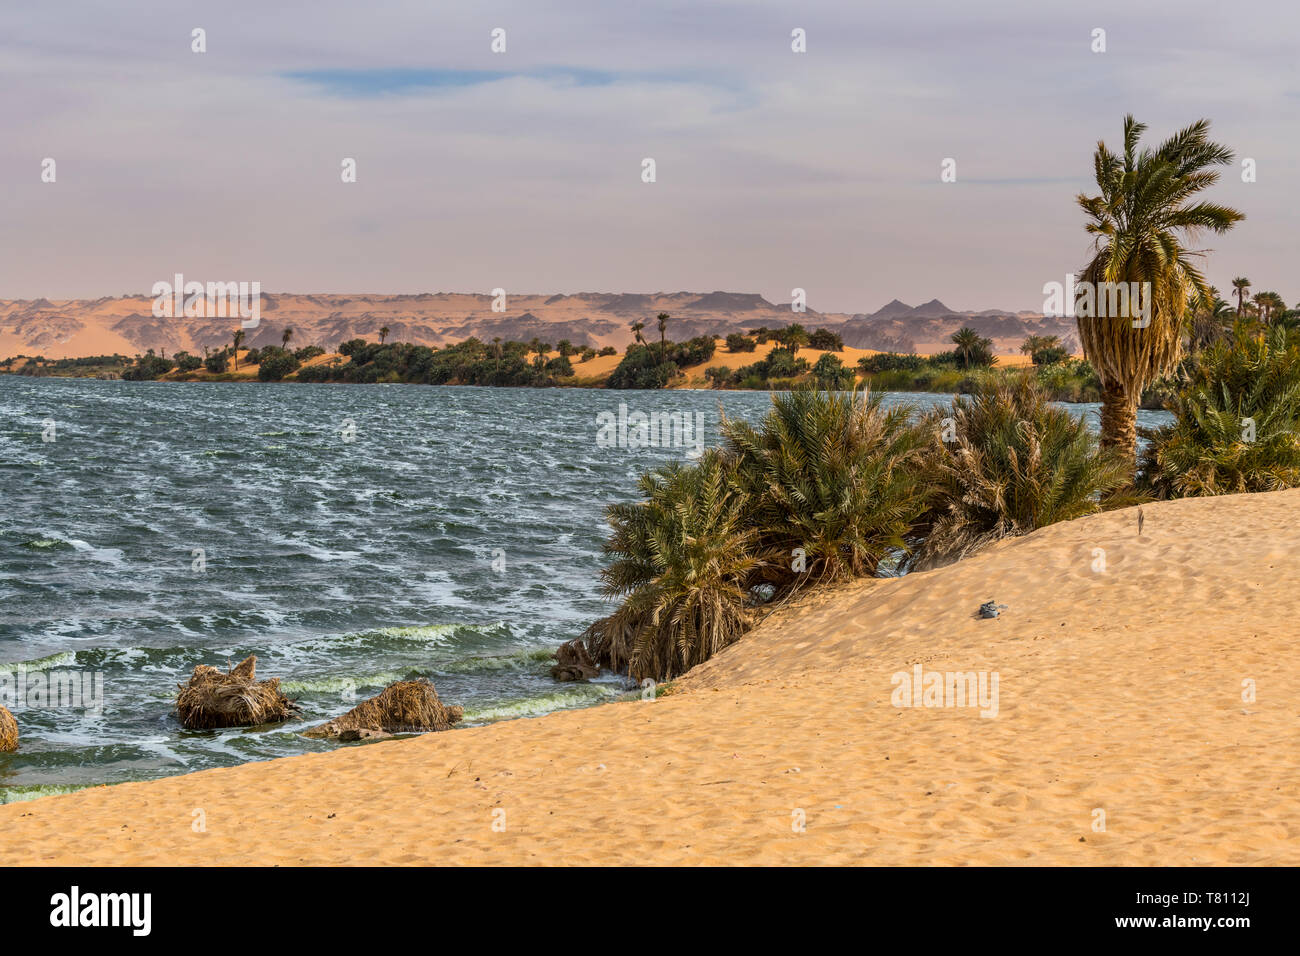 Ounianga Sebir part of the Ounianga lakes, UNESCO World Heritage Site, northern Chad, Africa - Stock Image